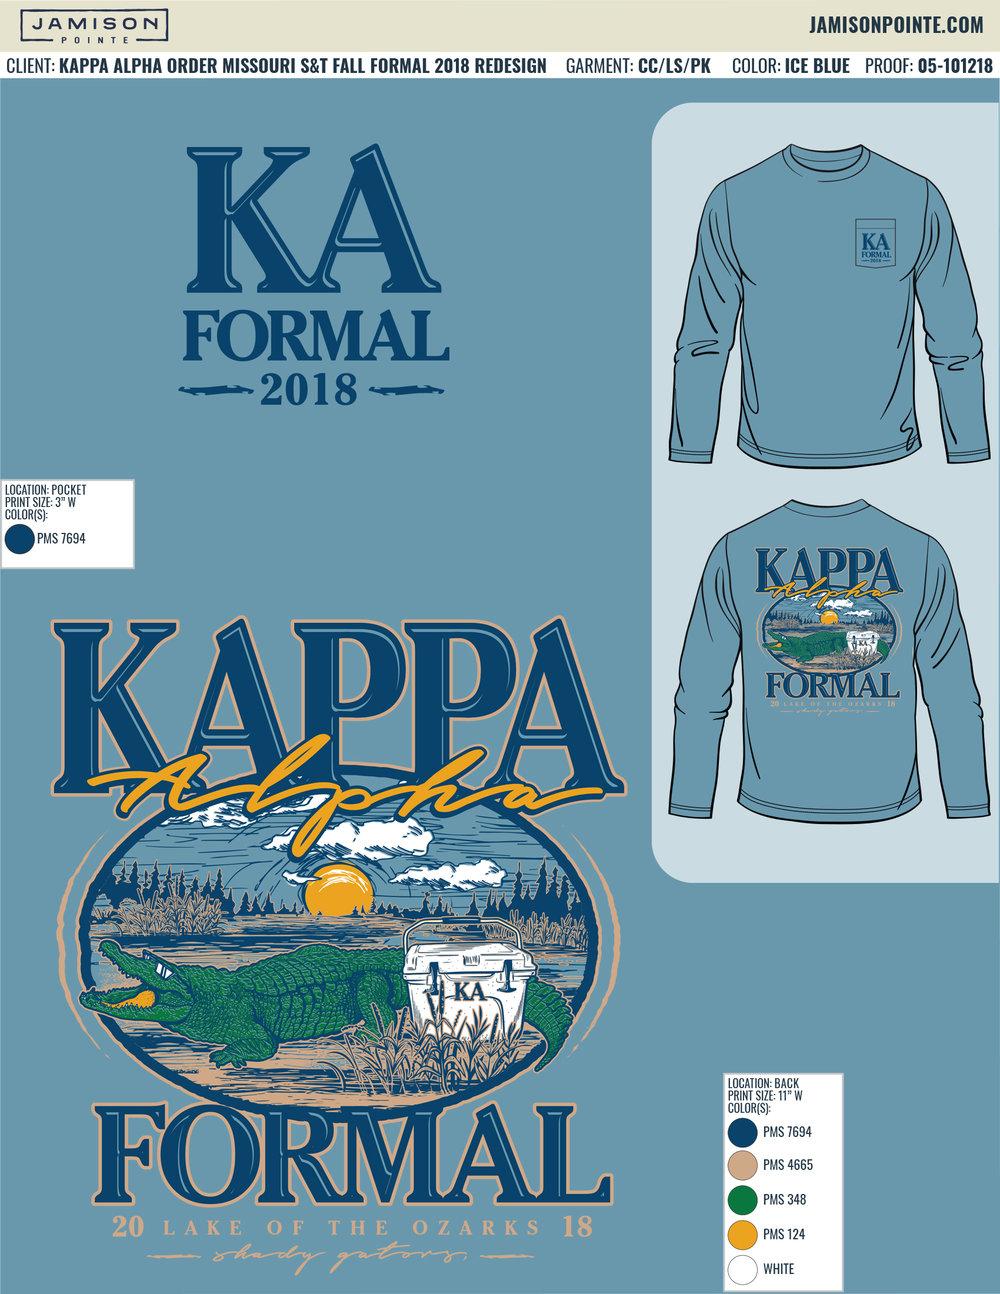 05-101218 Kappa Alpha Order Missouri S&T Fall Formal 2018 Redesign.jpg